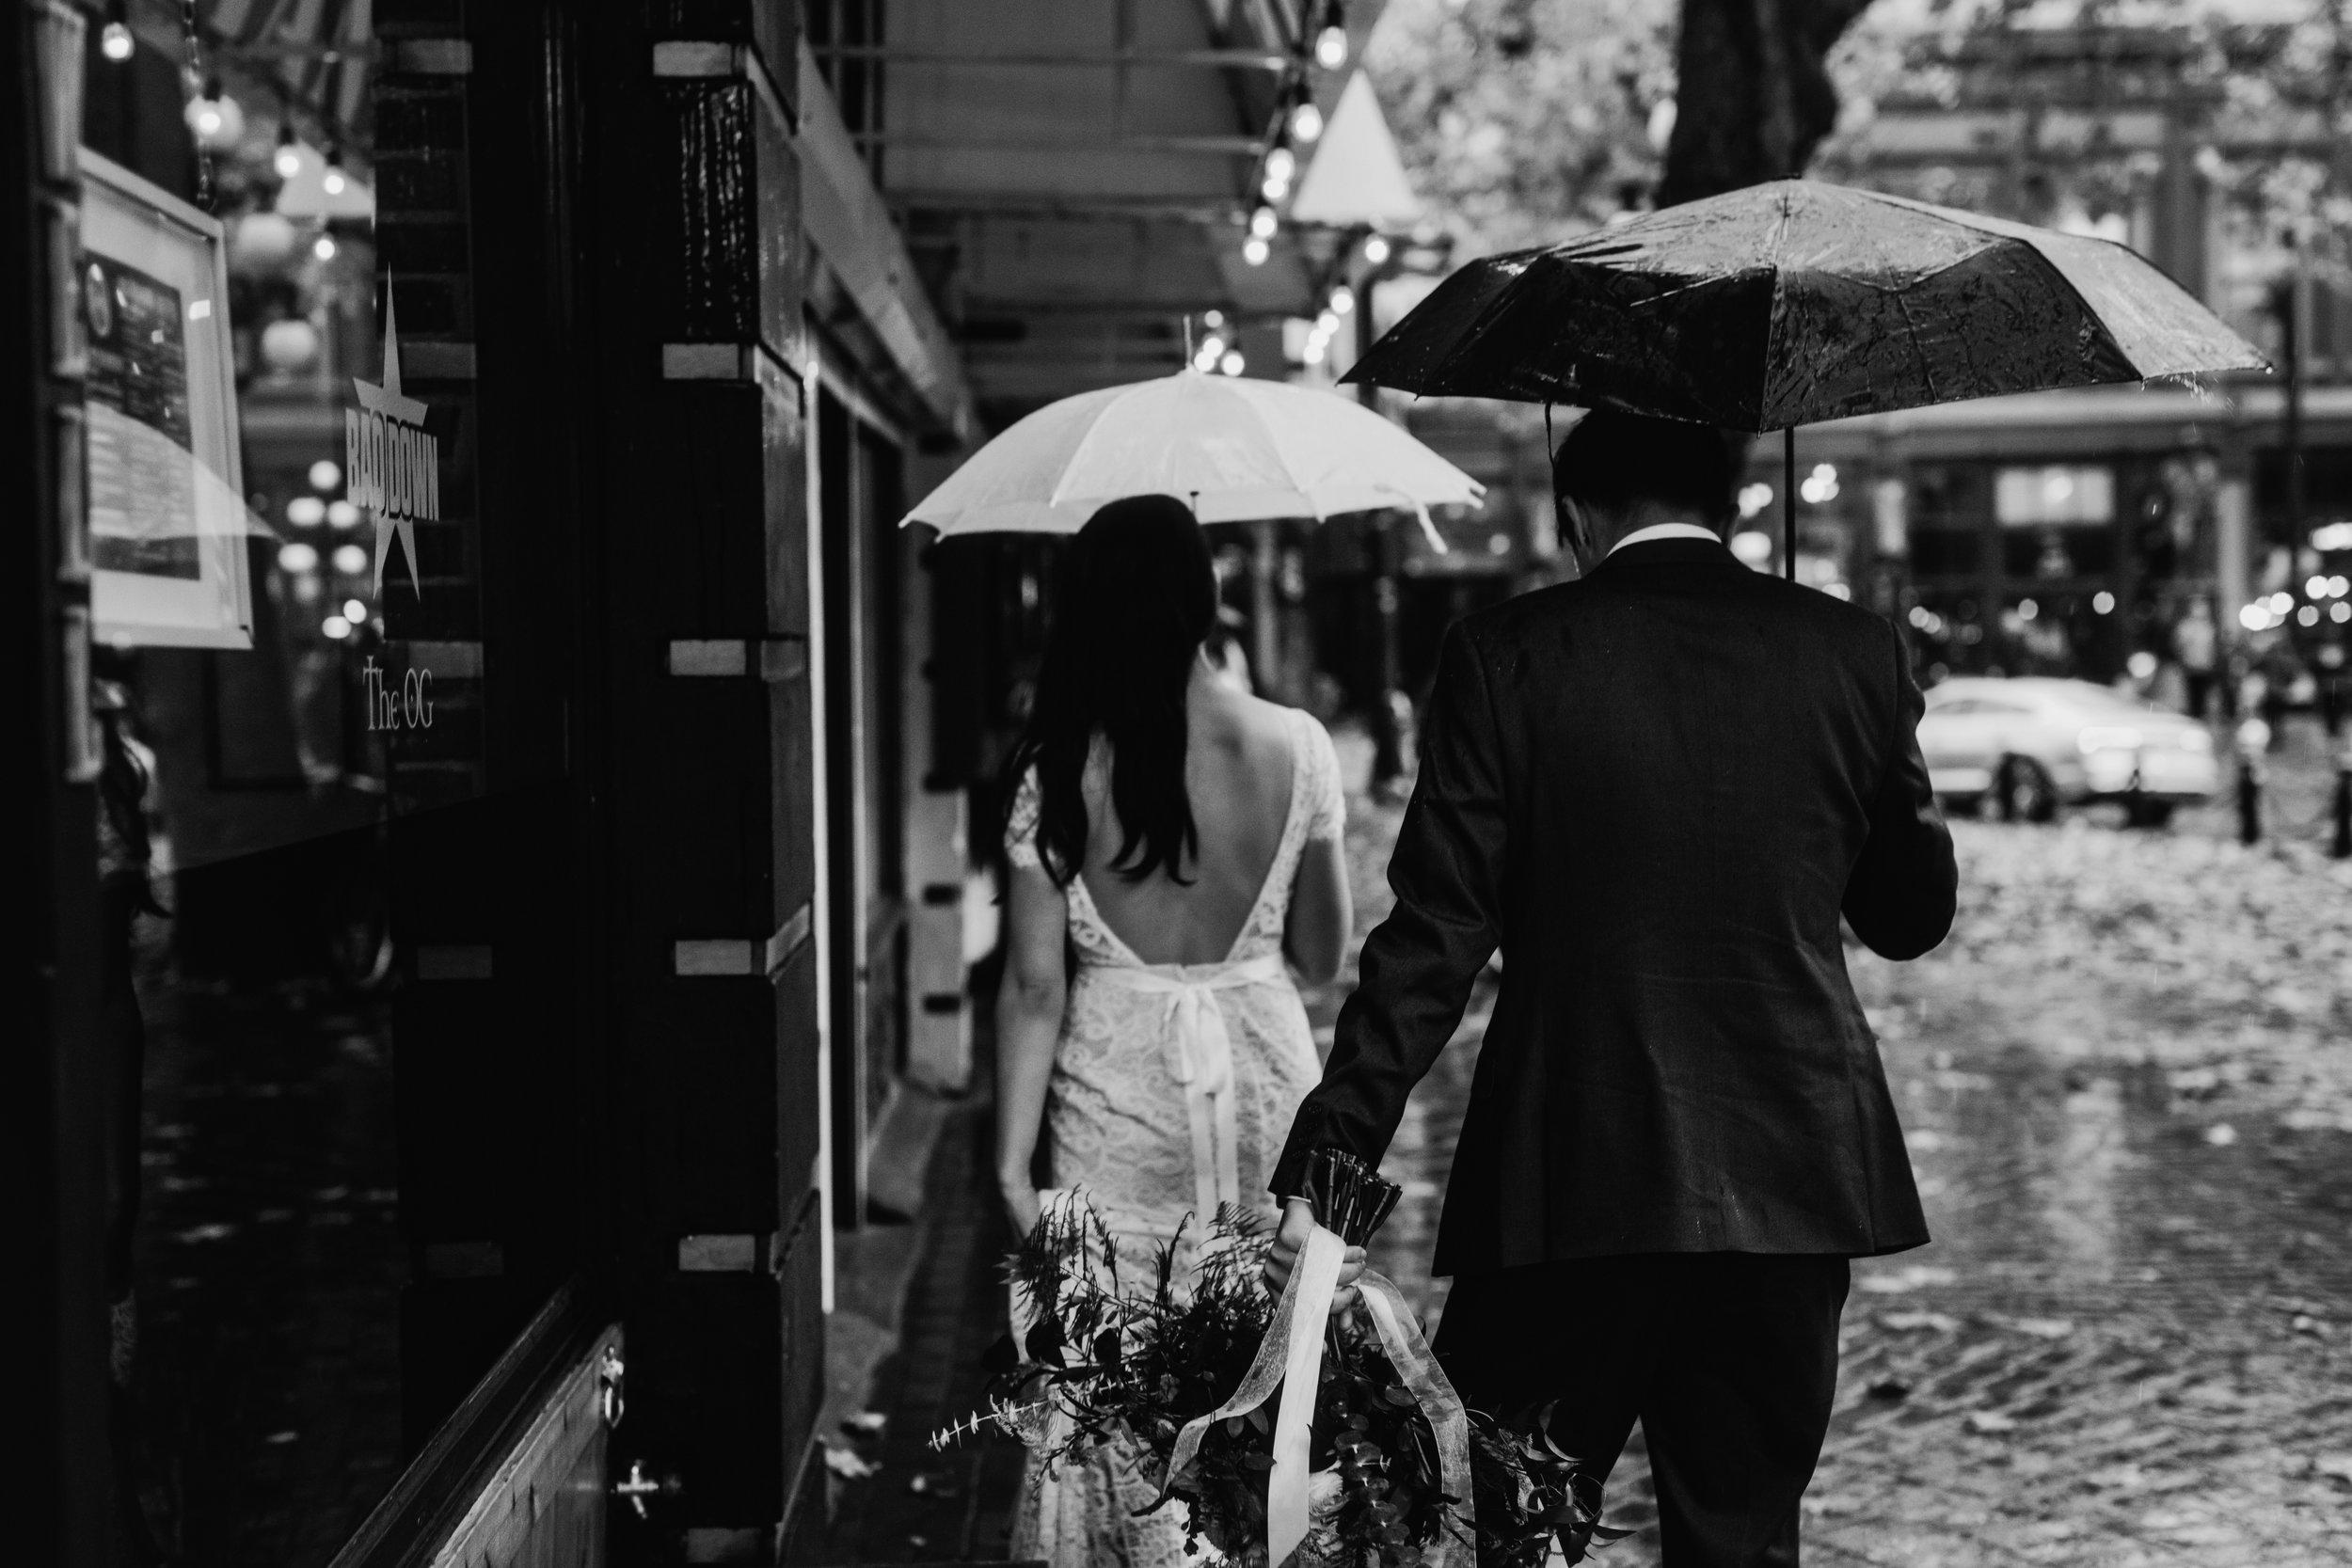 bride and groom walking in the rain in gastown vancouver